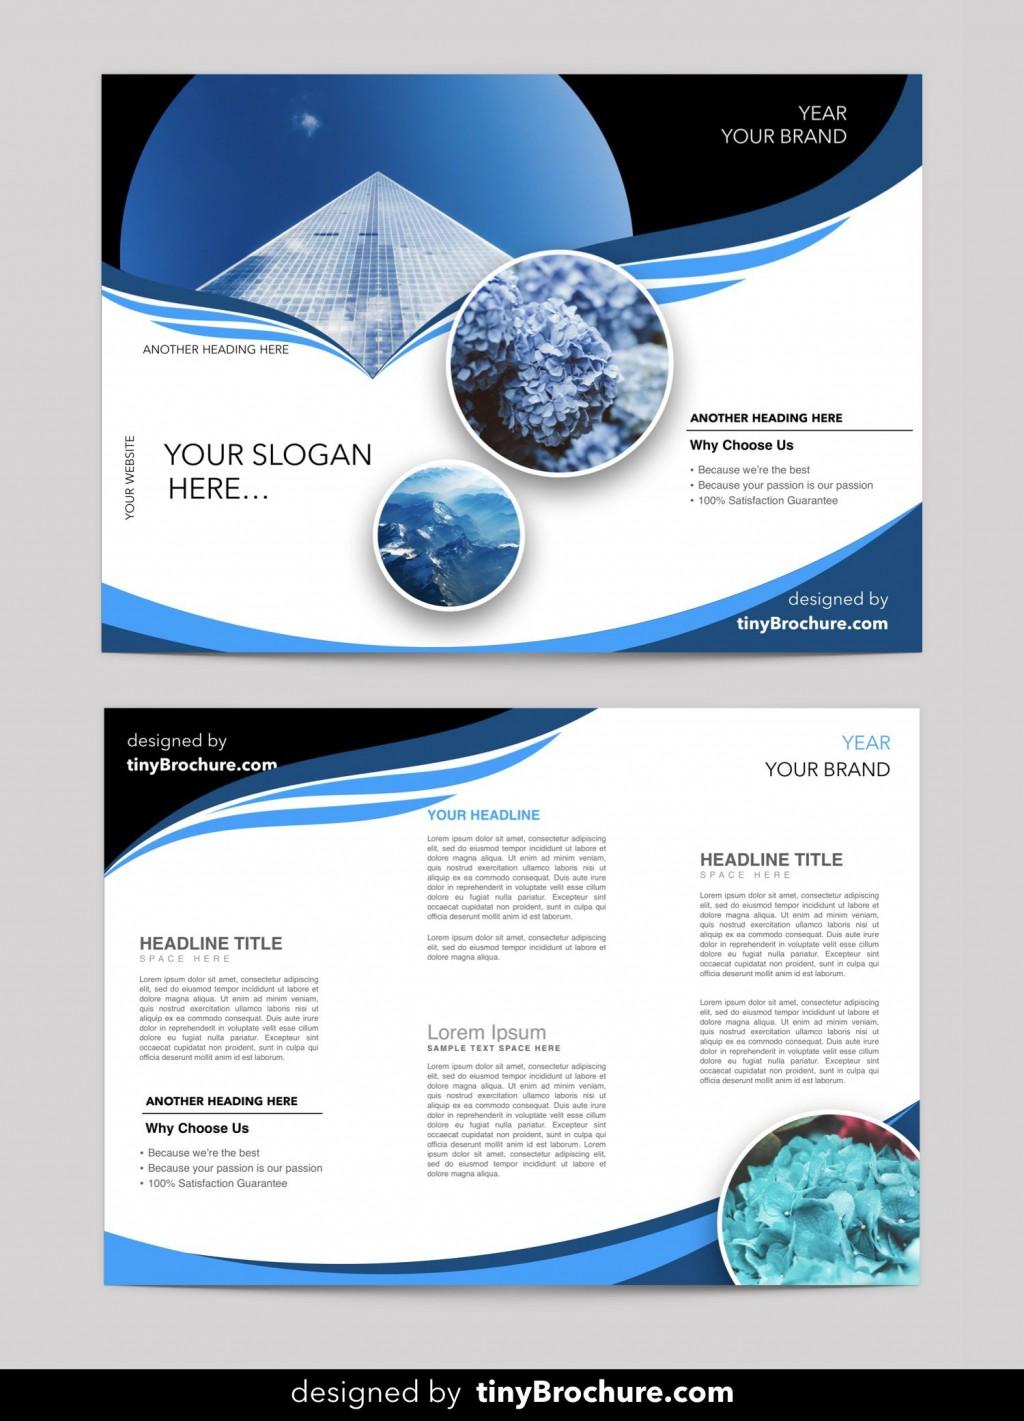 003 Wondrou Microsoft Word Brochure Template Inspiration  M Free Download Design 2007 A4Large